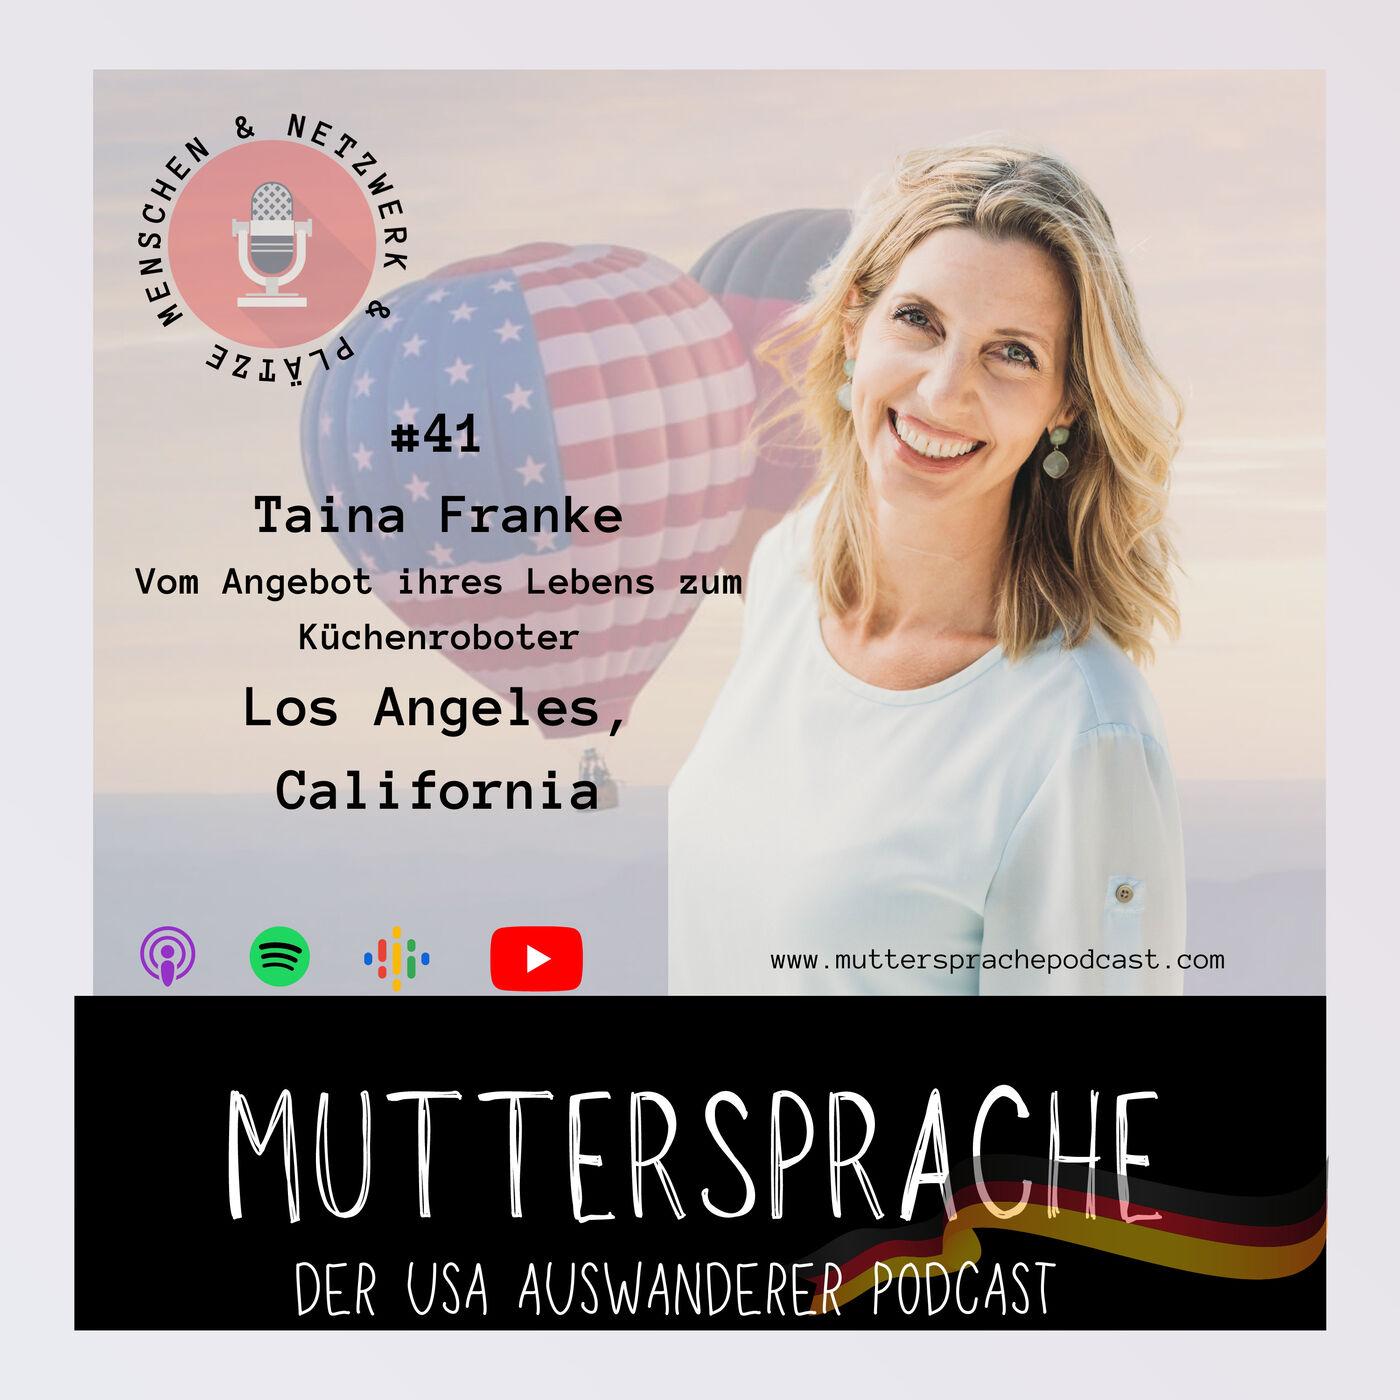 Folge 41: Vom Angebot Ihres Lebens zum Küchenroboter -  TAINA FRANKE - Los Angeles California